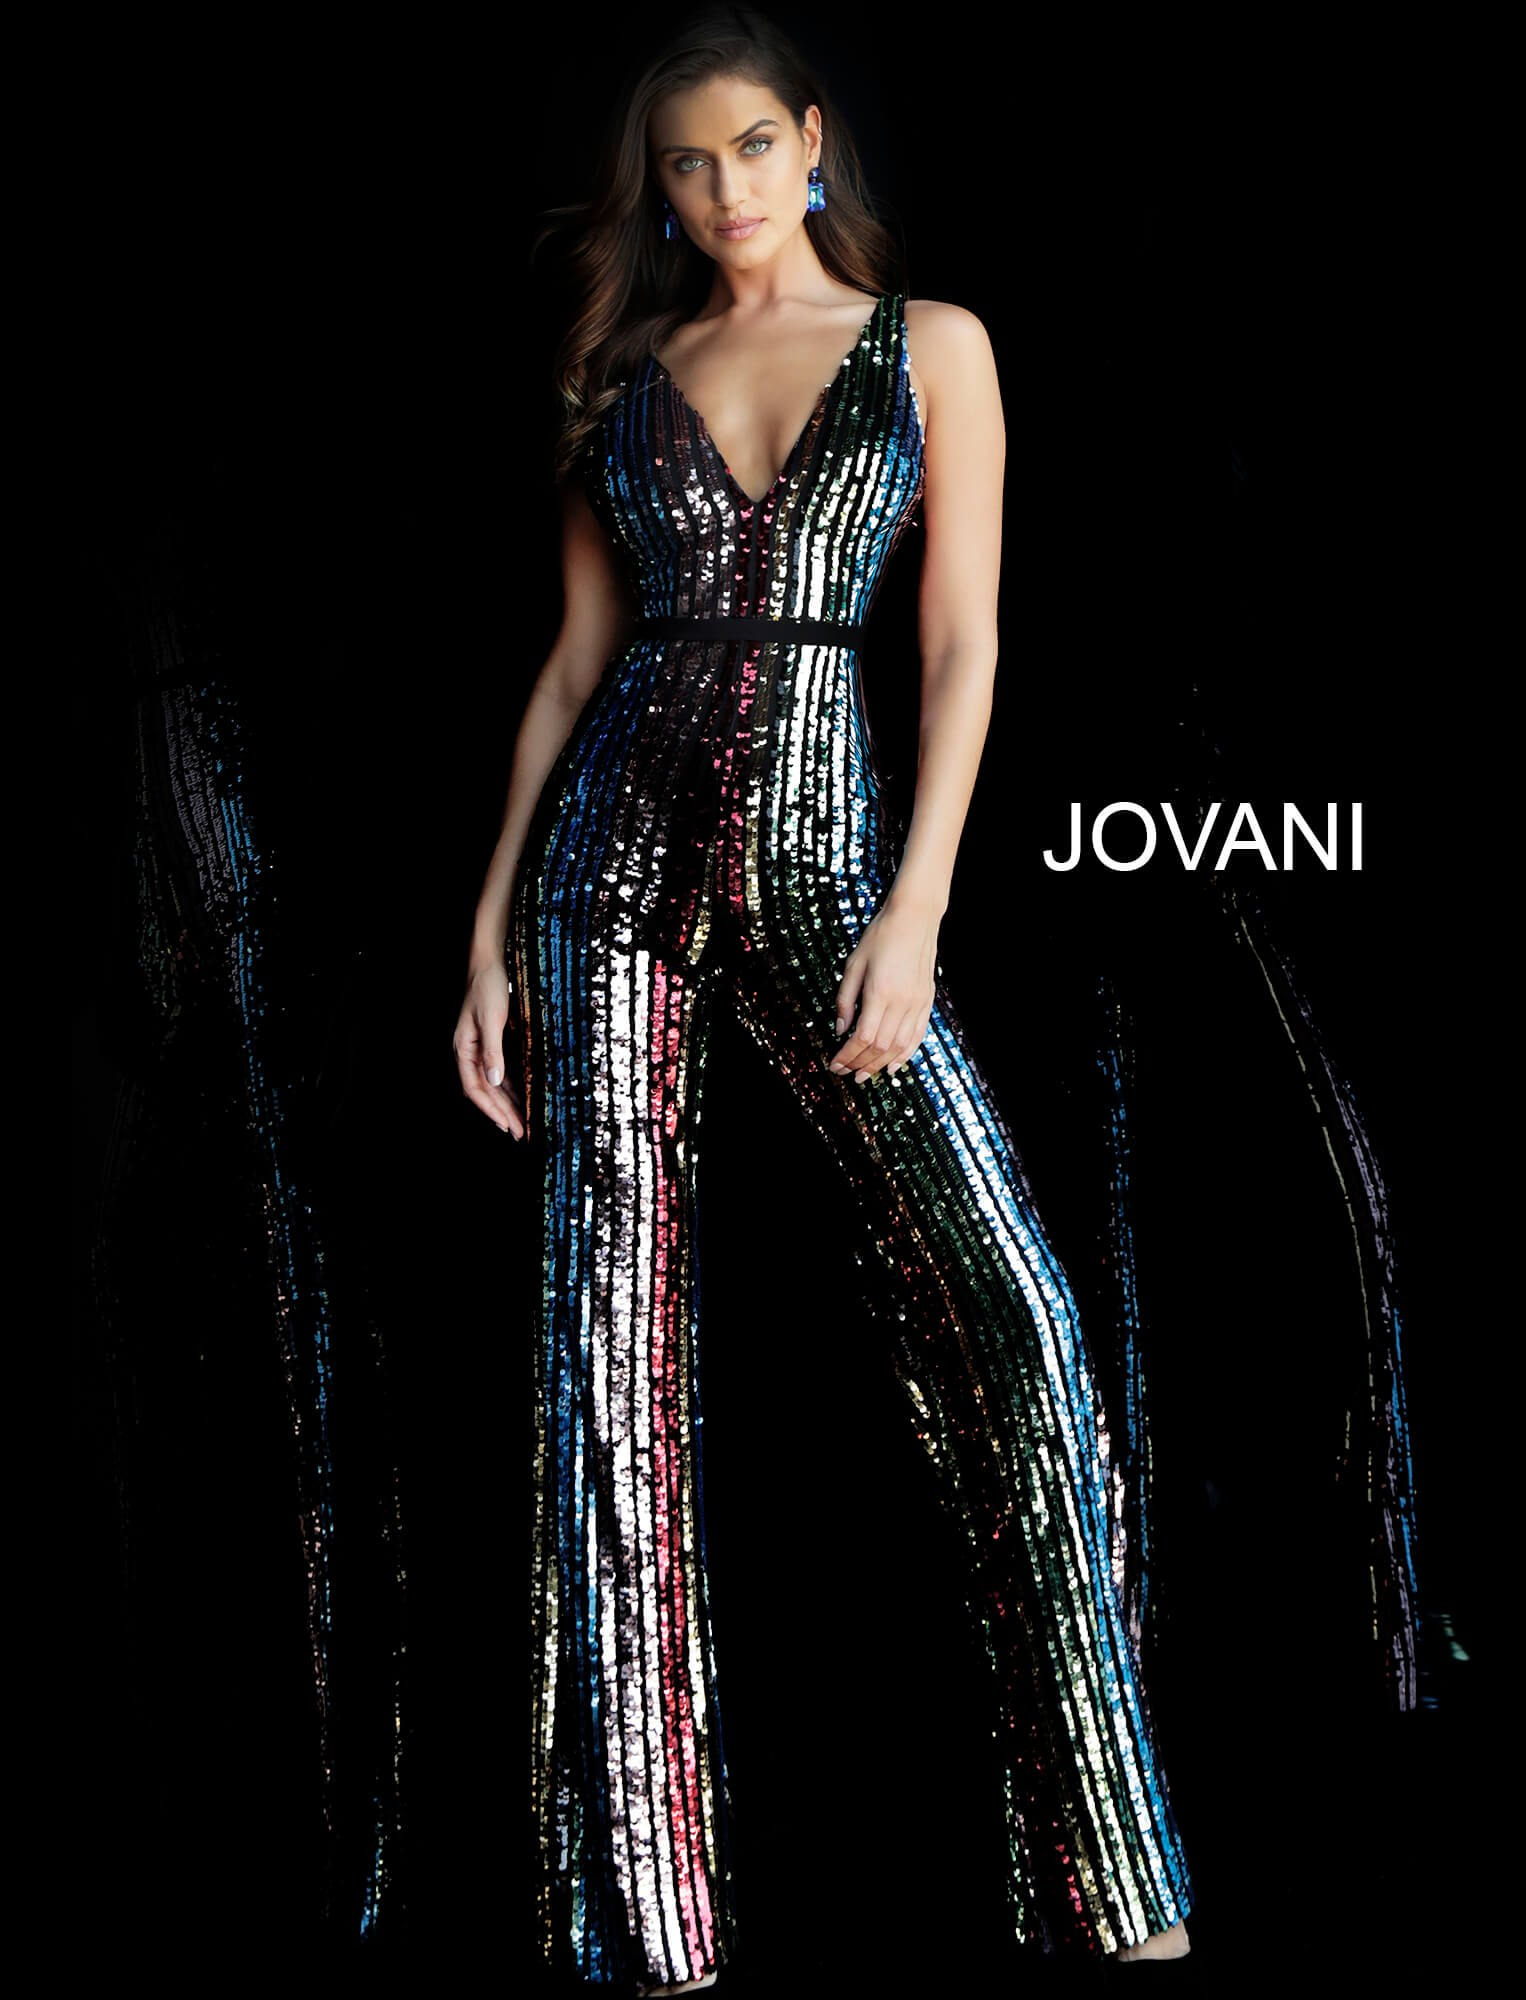 Jovani 65396 Sexy Sequin Formal Romper Jumpsuit Prom Dress